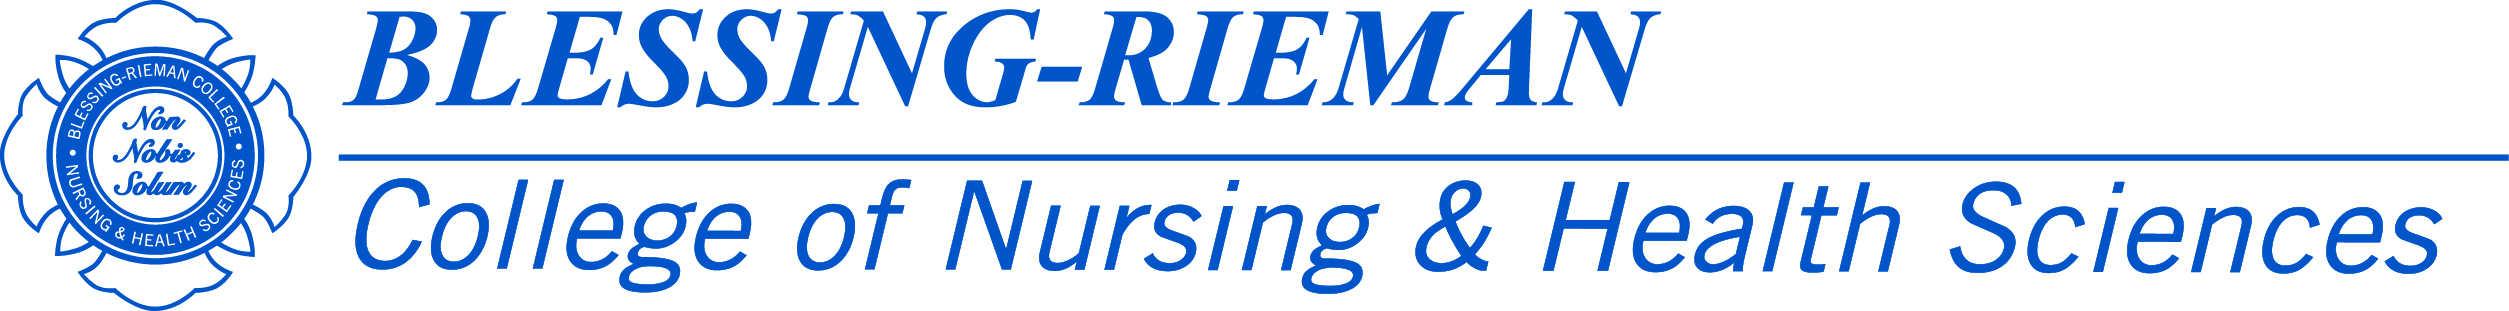 blessing rieman college of nursing health sciences logo 5383